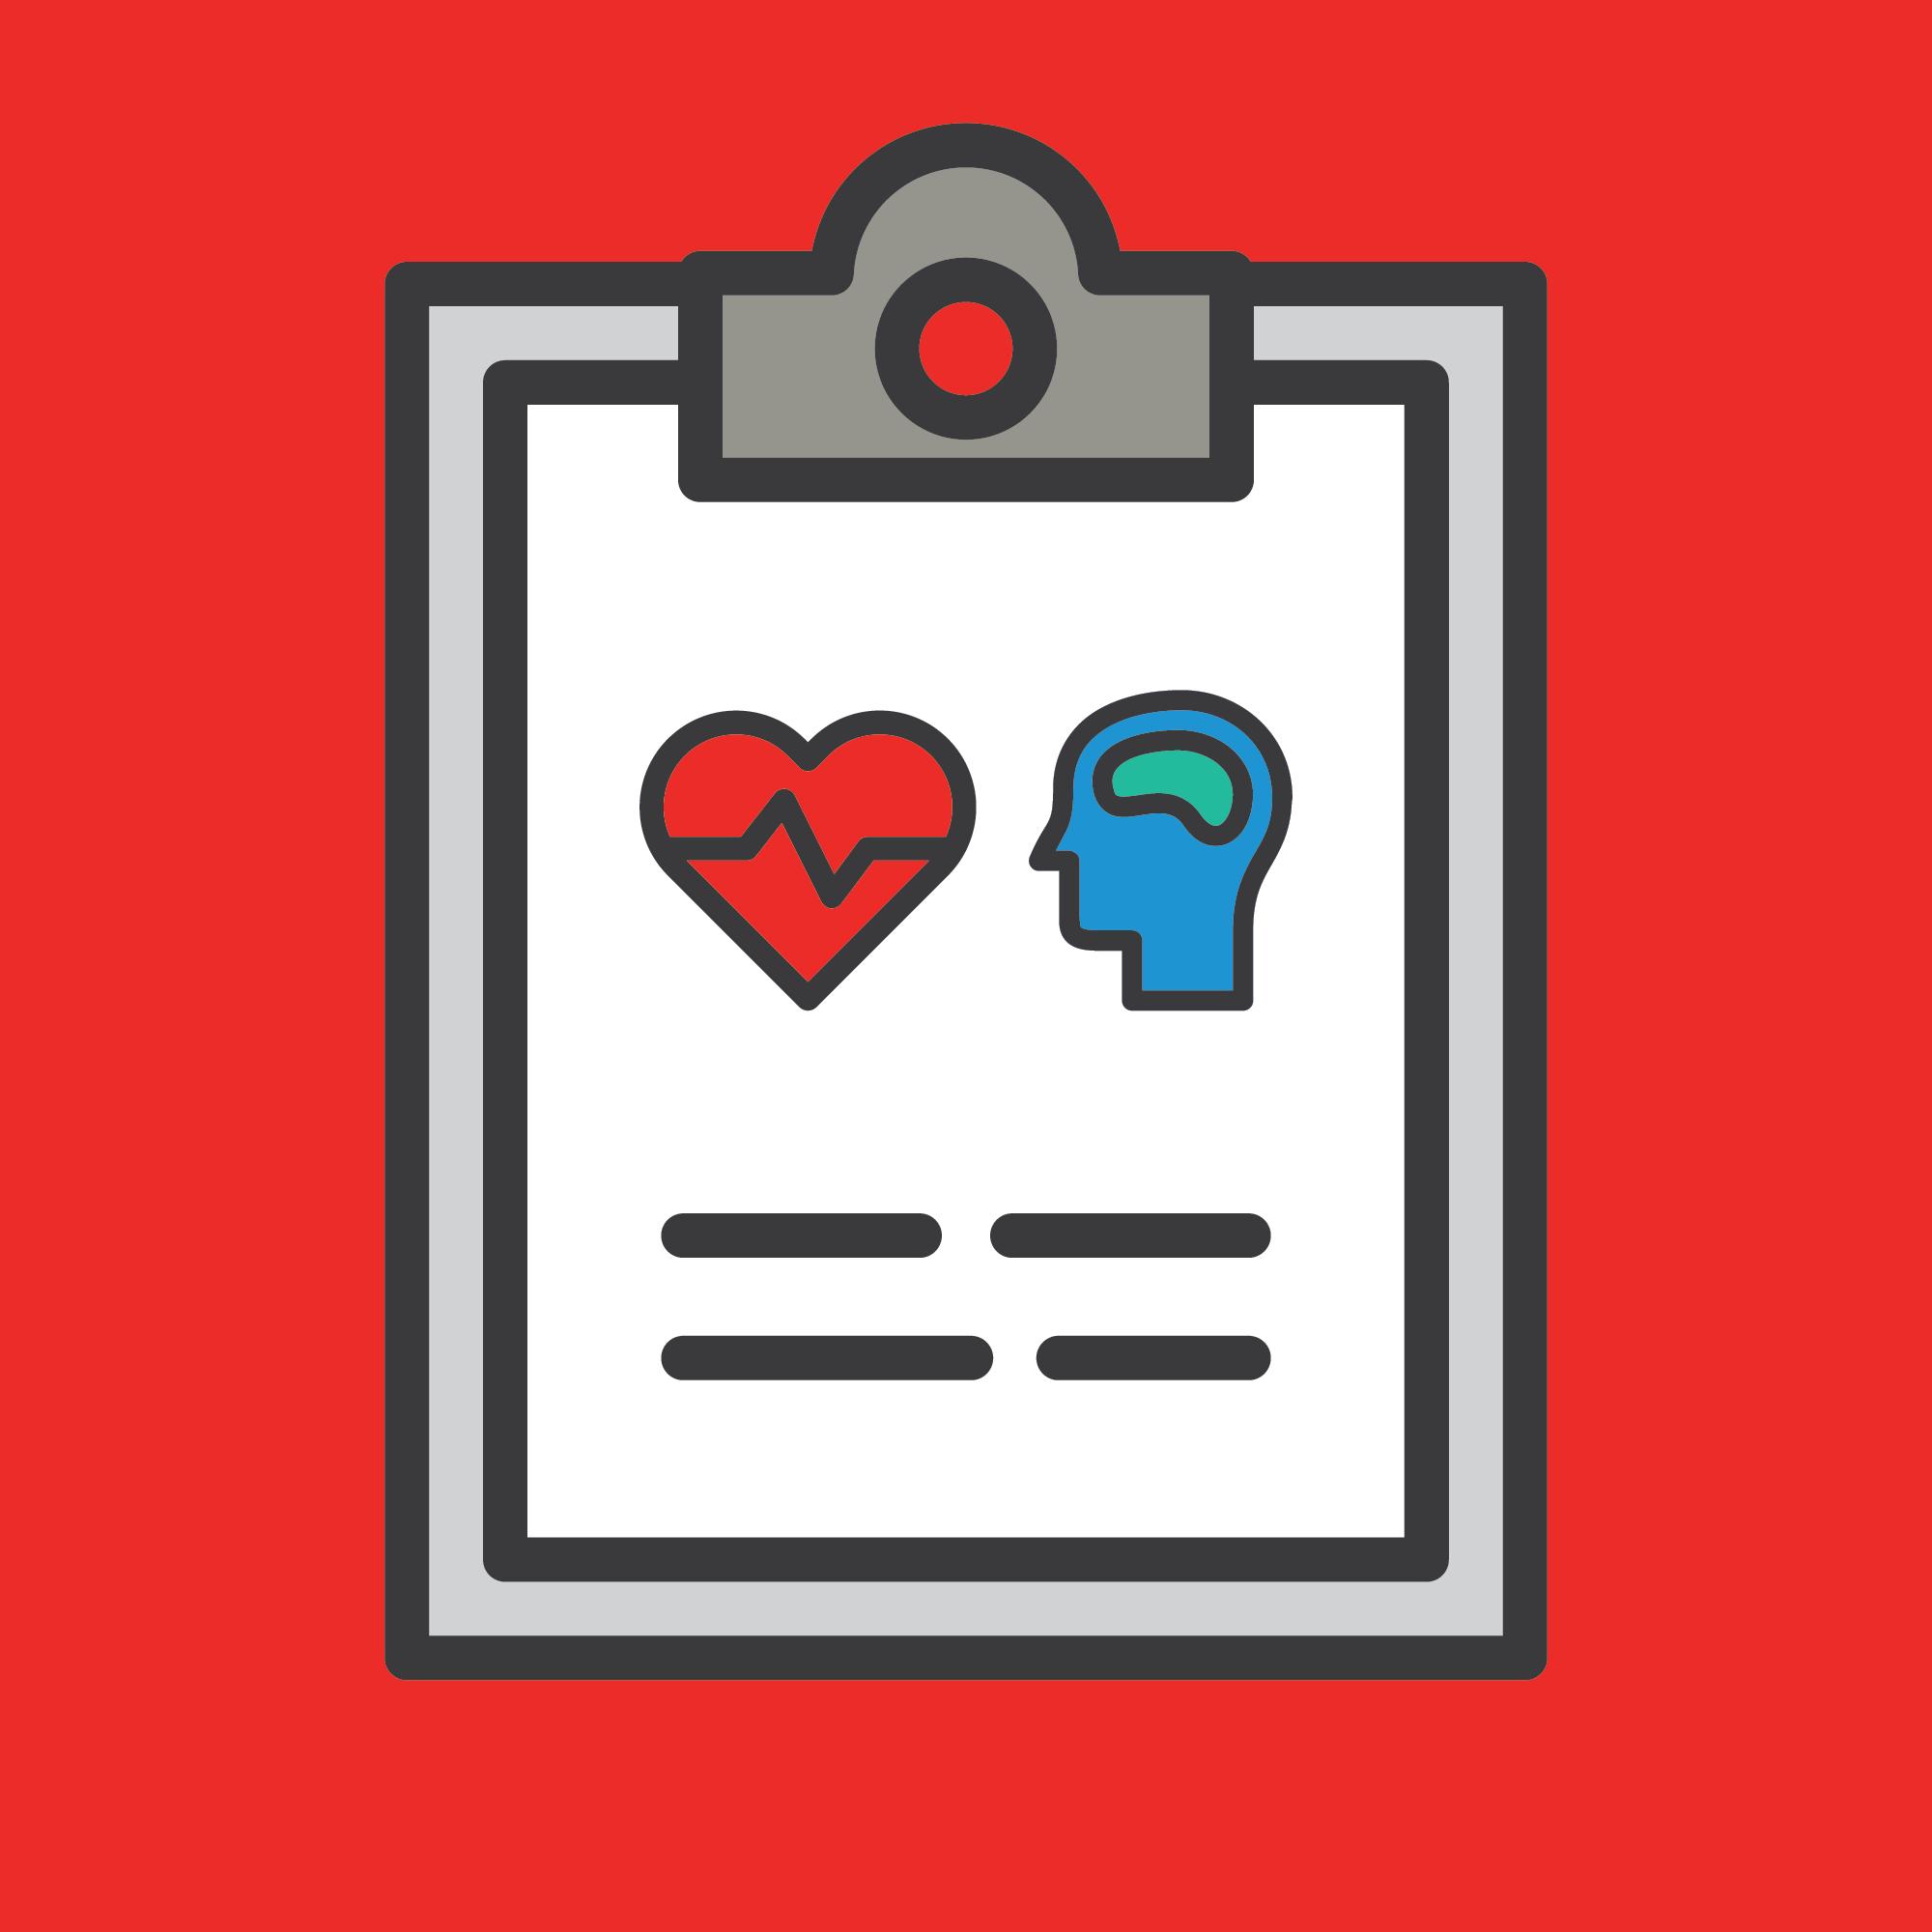 SOMD_2020_VirtualMOVEment_Web_Home_Initiatives_1_HealthWellness